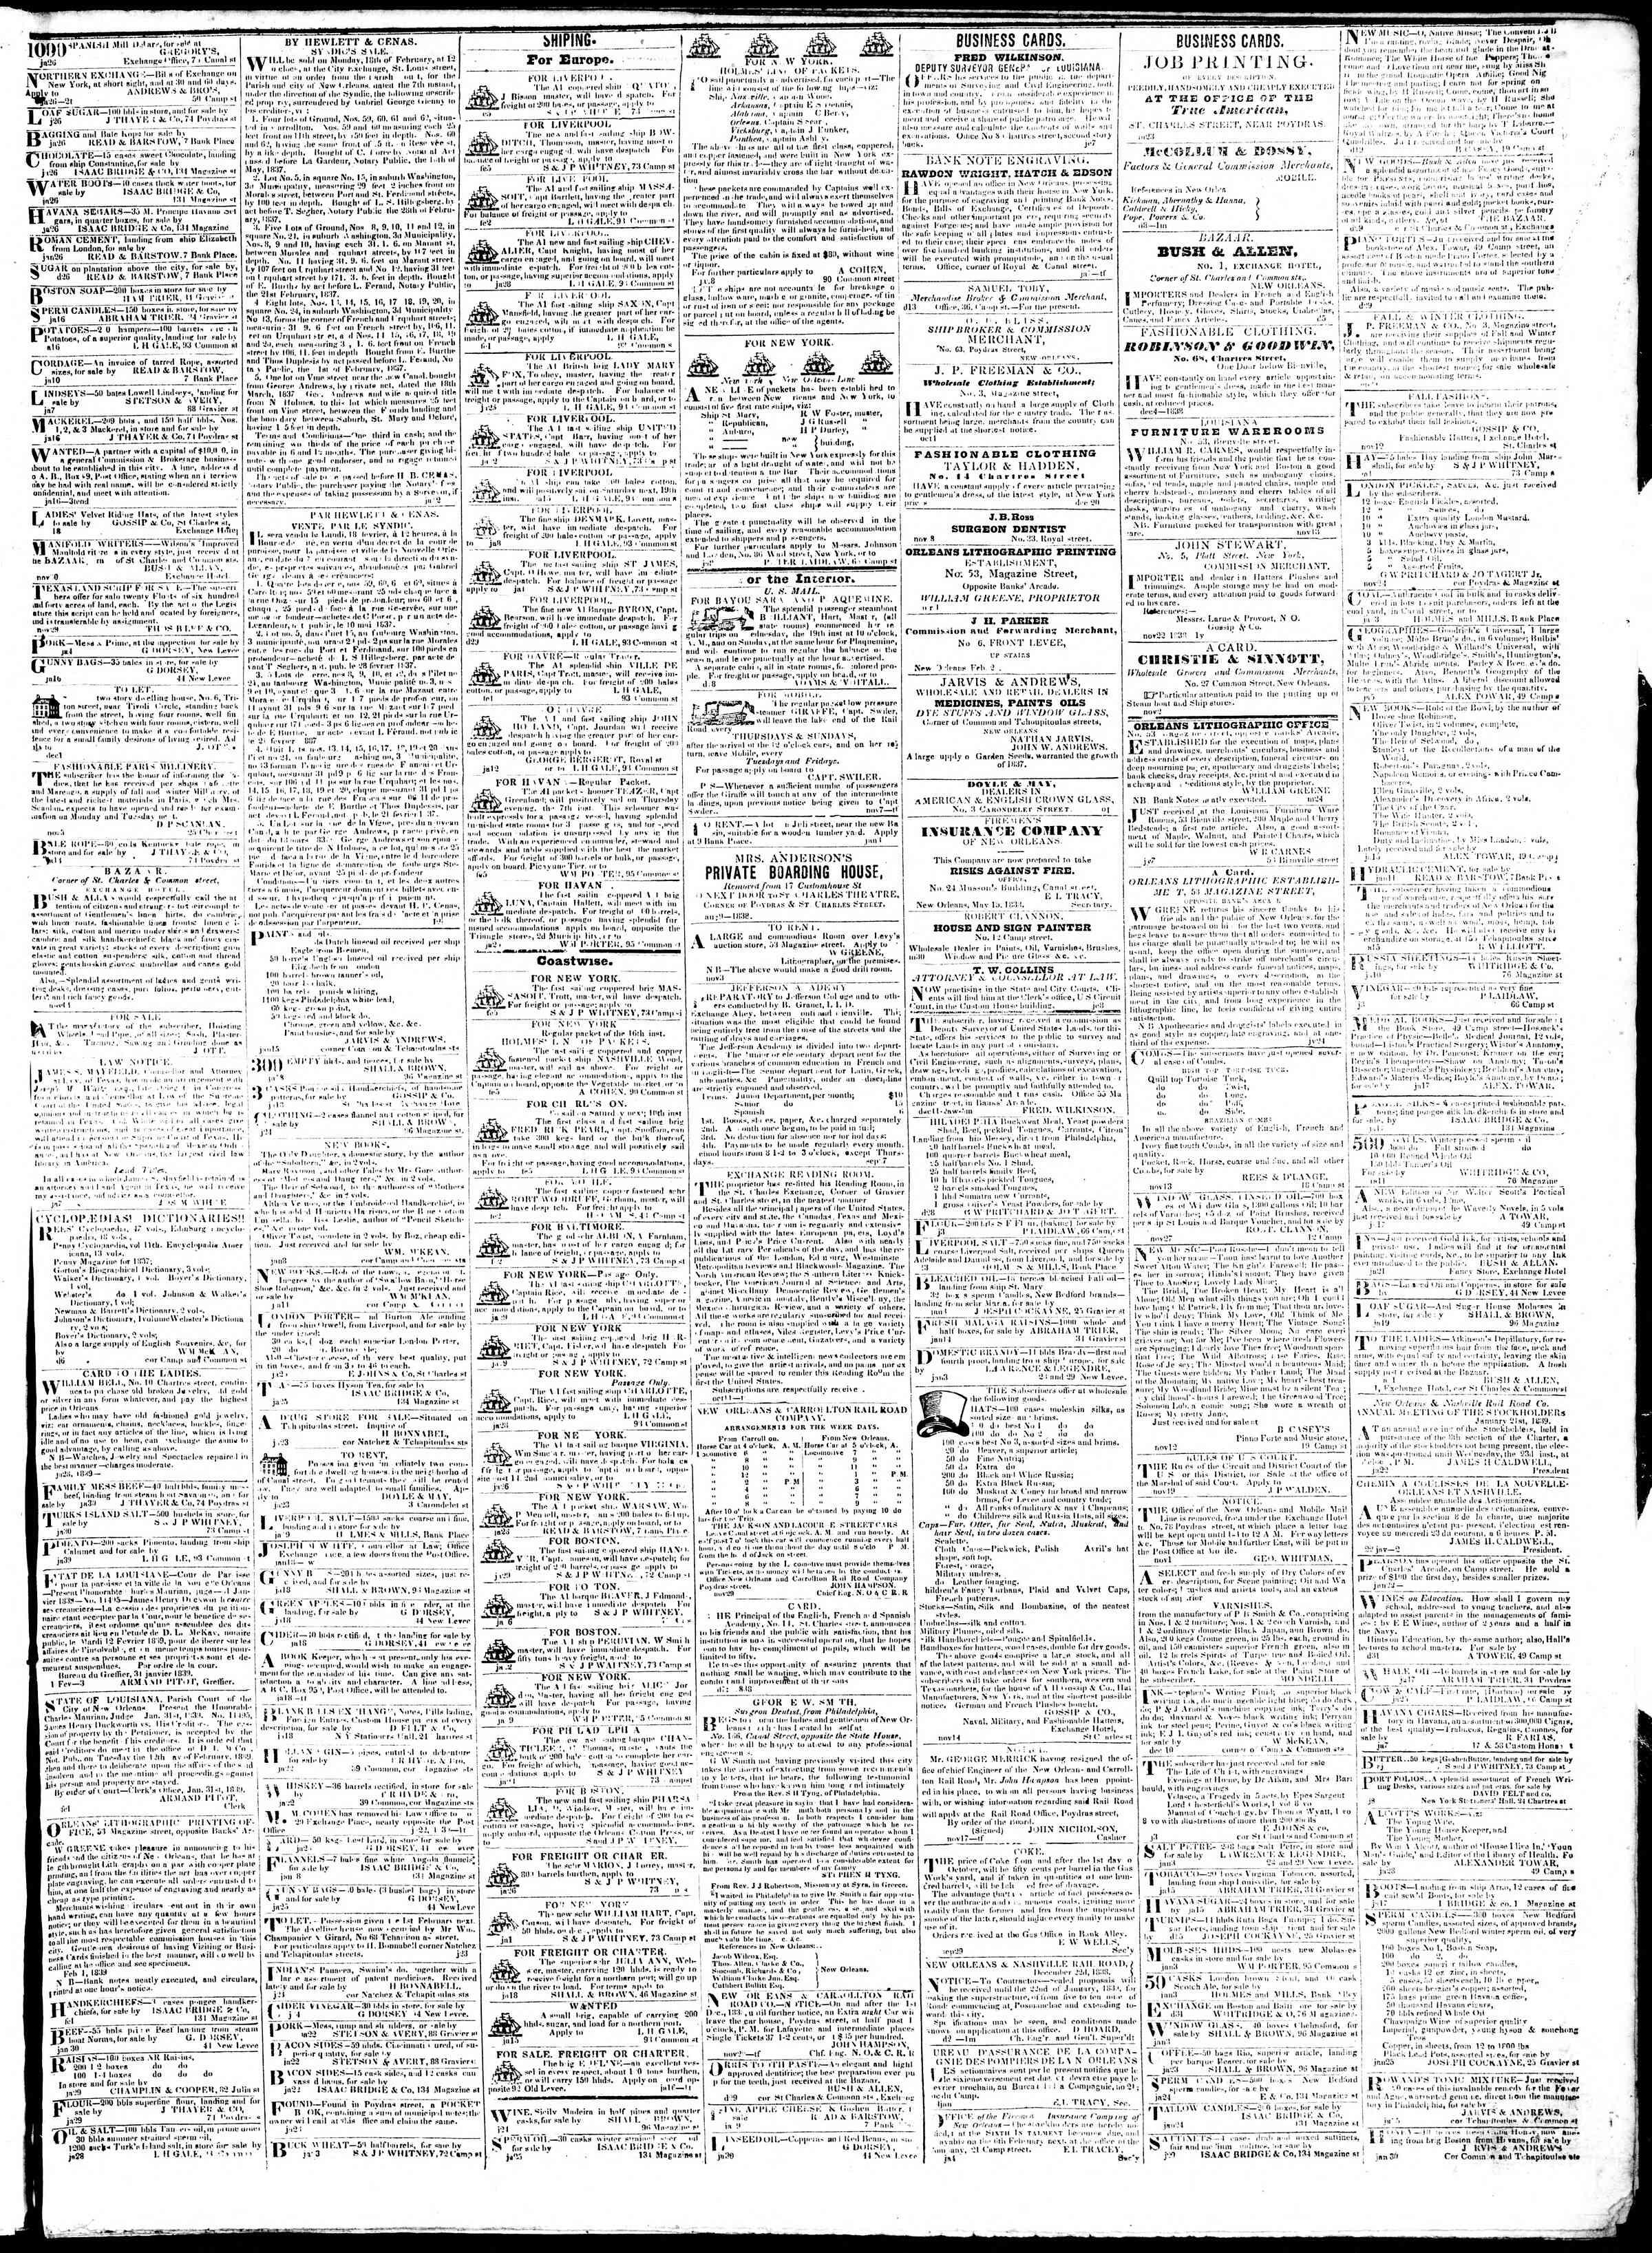 February 6, 1839 Tarihli True American Gazetesi Sayfa 3